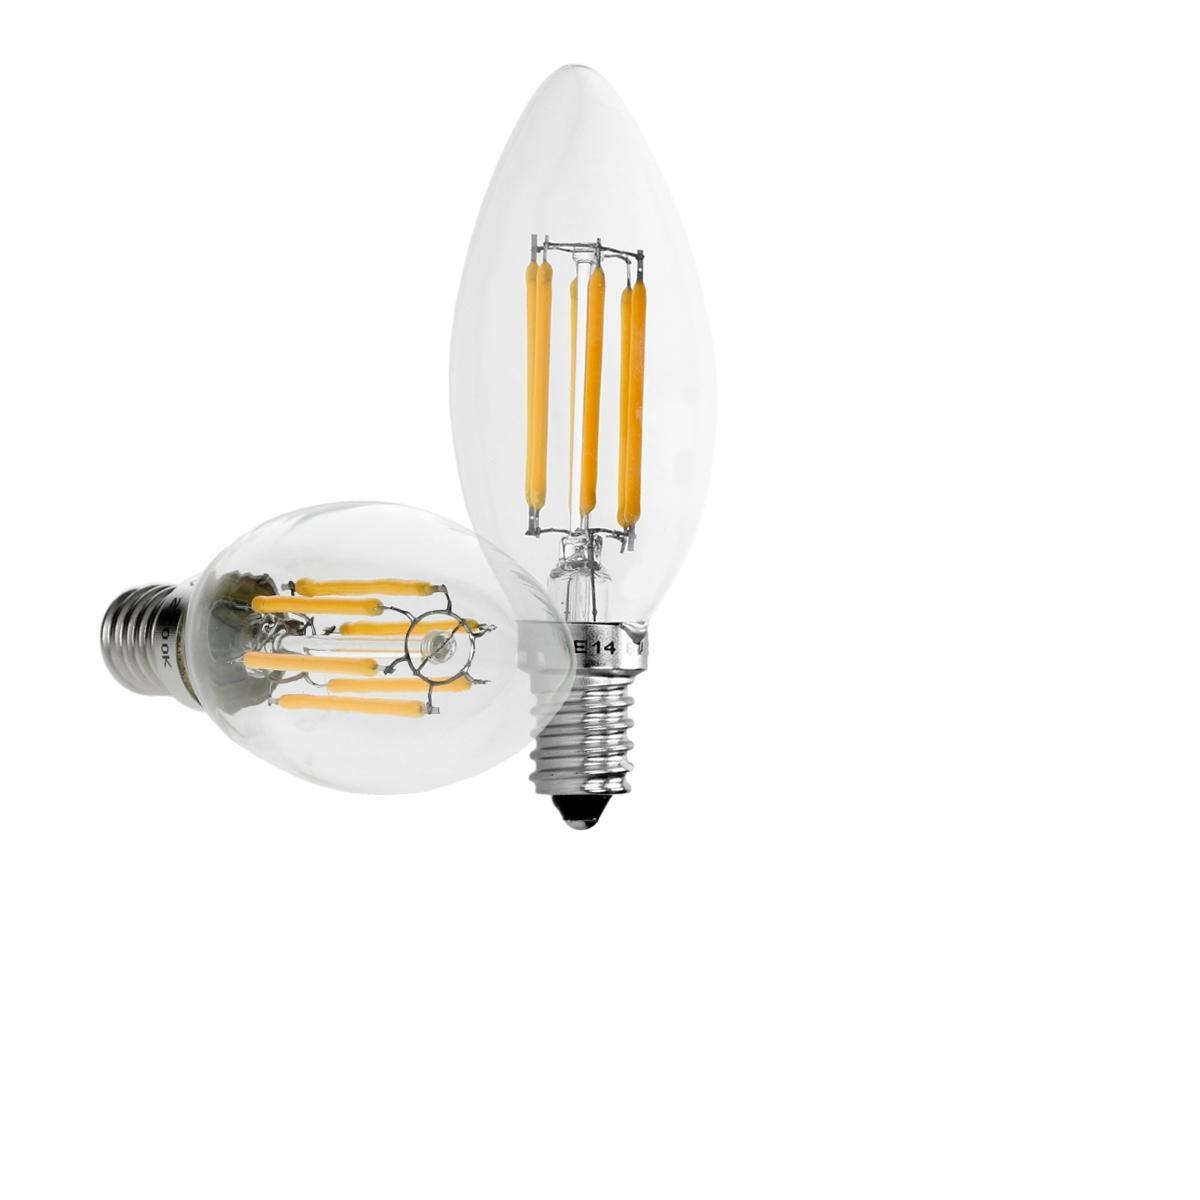 Ecd Germany 6 x lampe LED filament de bougie E14 6W blanc chaud